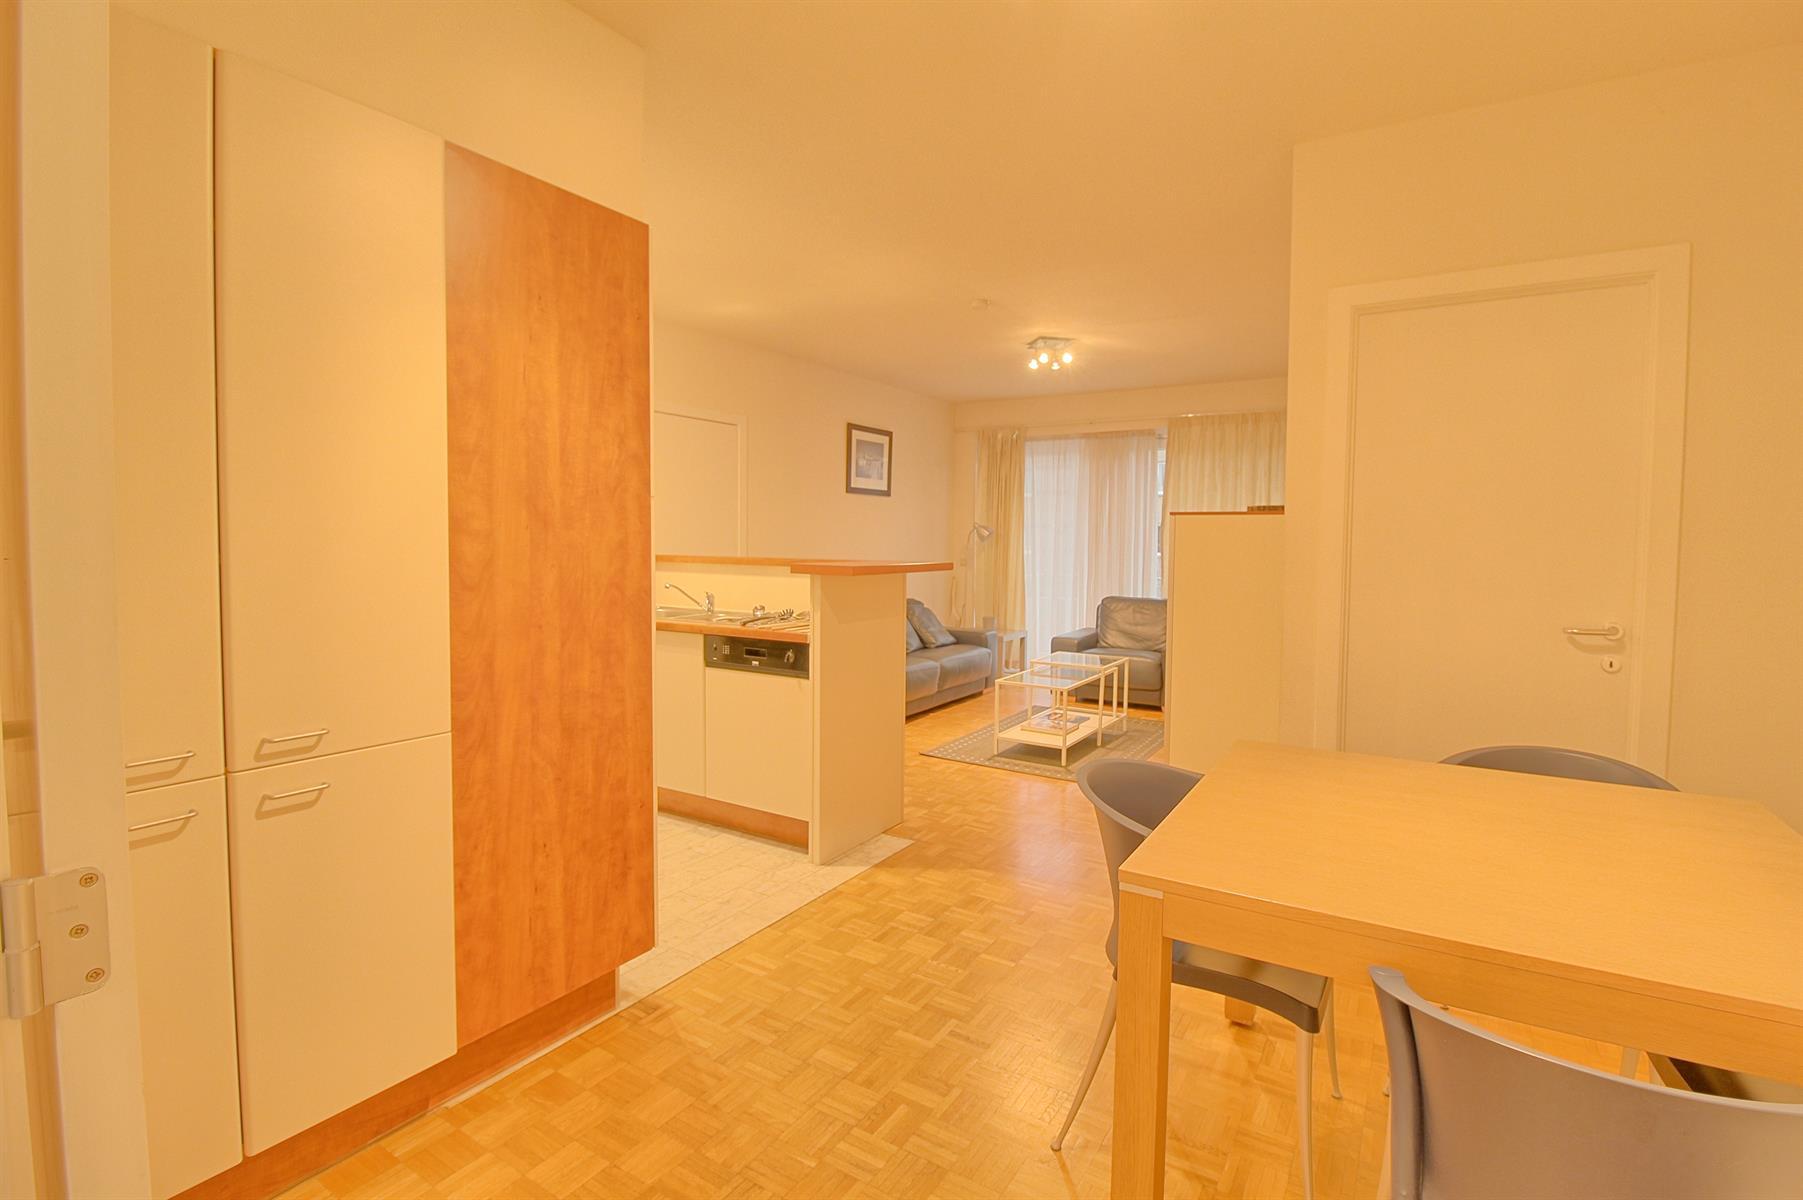 Appartement - Woluwe-Saint-Lambert - #4208881-0